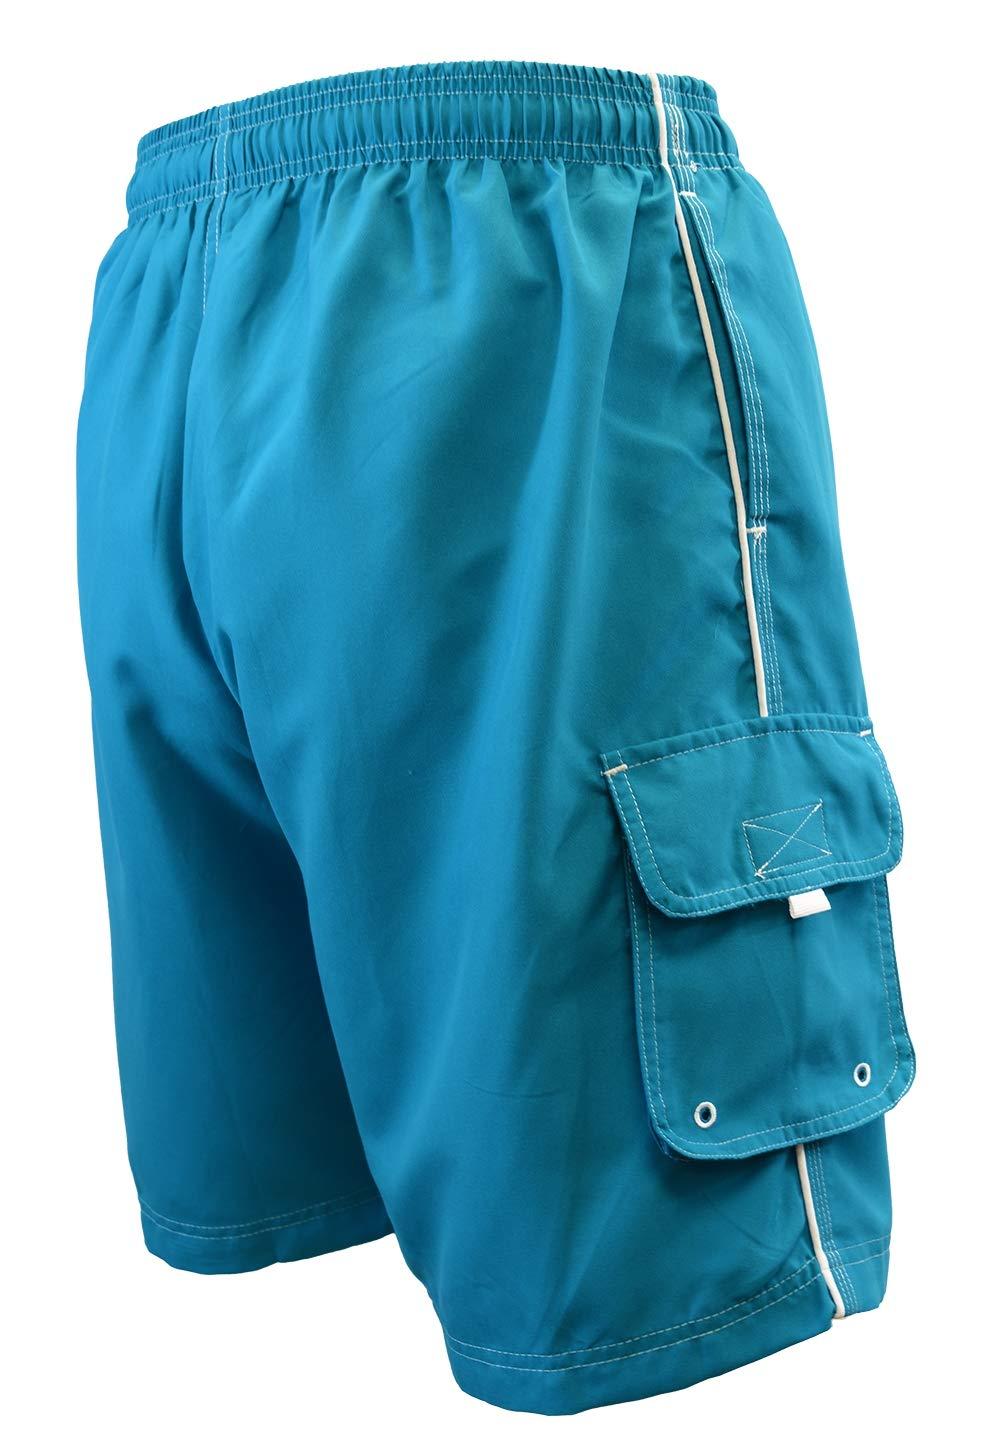 6a8ce026fb Amazon.com: Adoretex Men's Swim Trunks Watershort Swimsuit with Mesh Liner:  Clothing